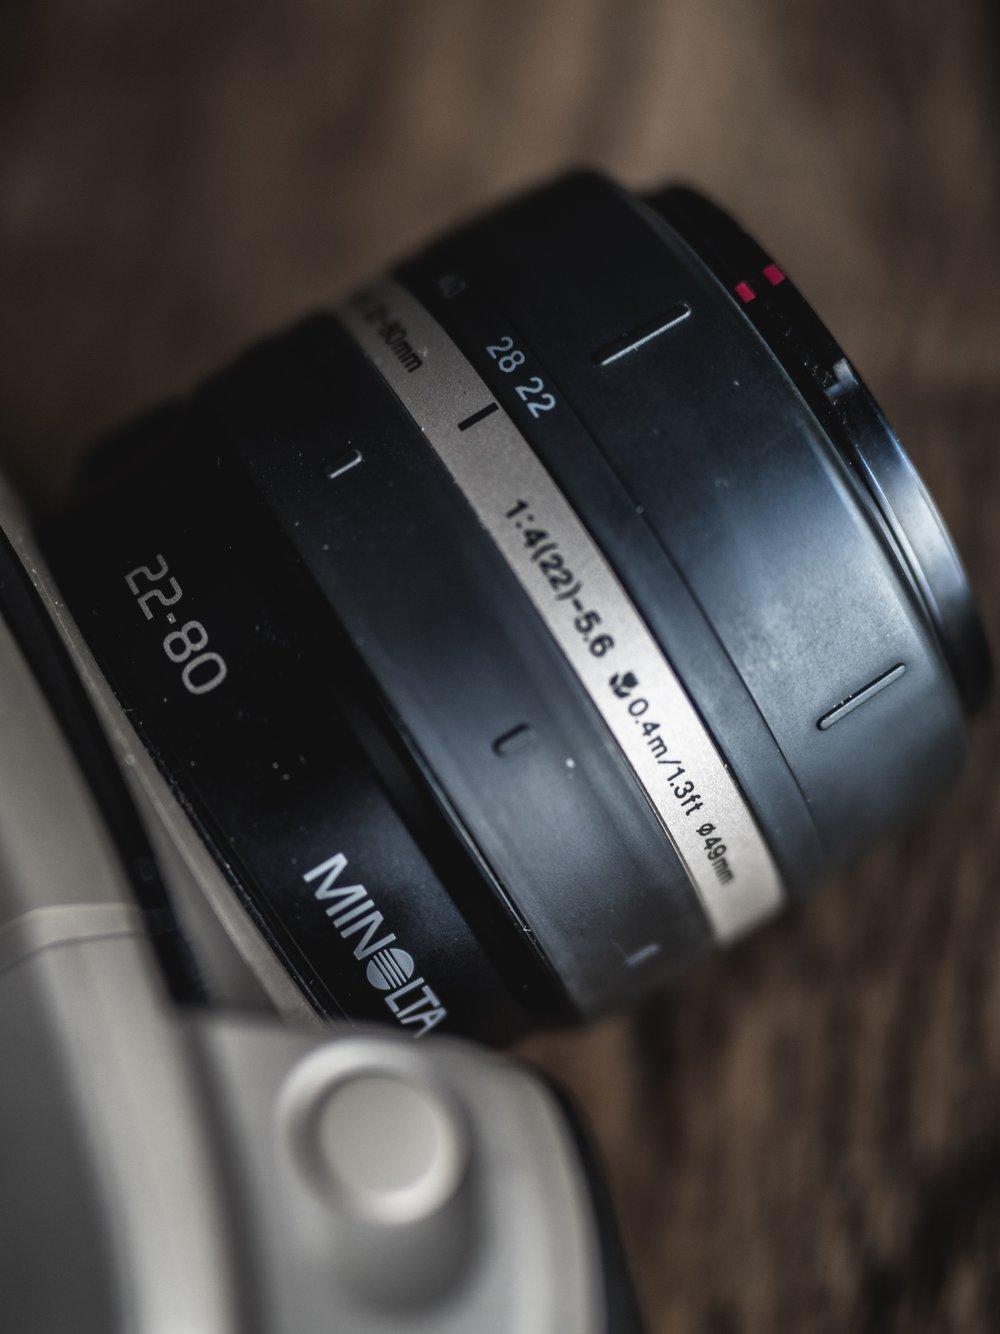 Minolta Vectis S-1 APS Advanced Photo System Advantix Film Camera Review 1996